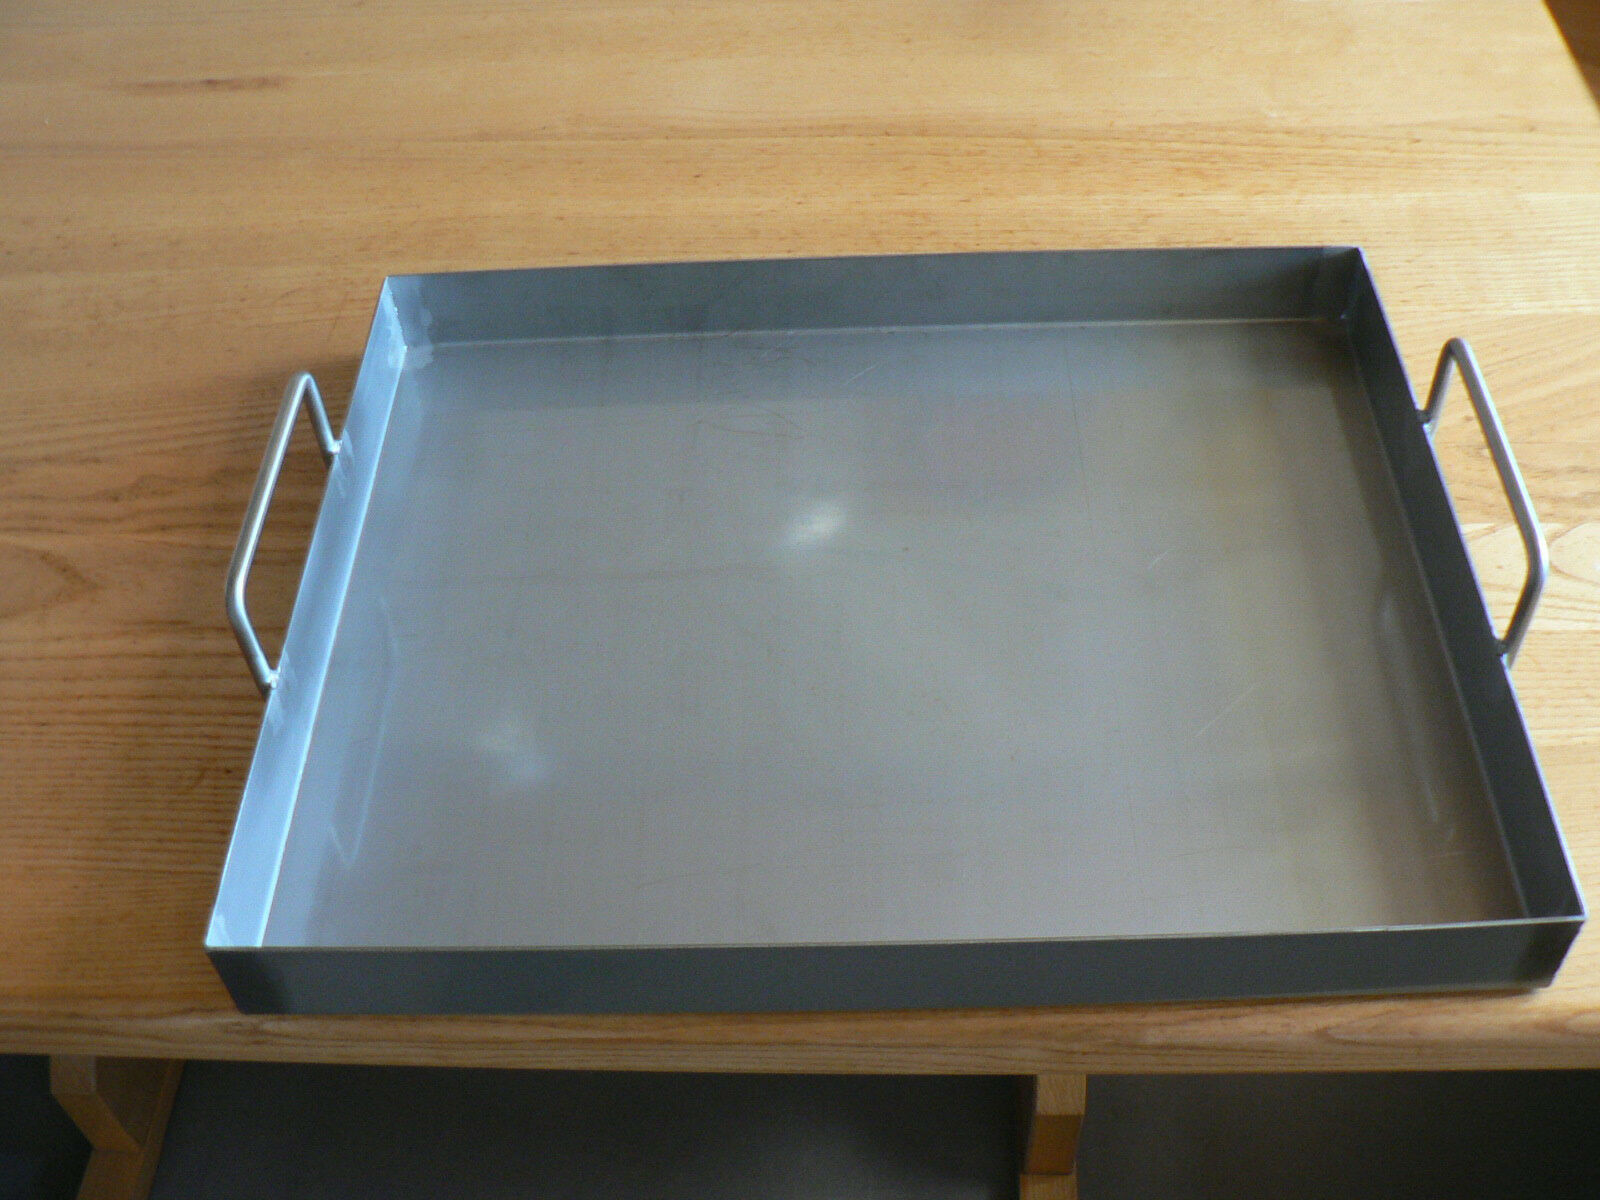 Edelstahl V2a-Grillwanne Spanferkelwanne Auffangwanne 400mm x 600mm x 50mm x 2mm